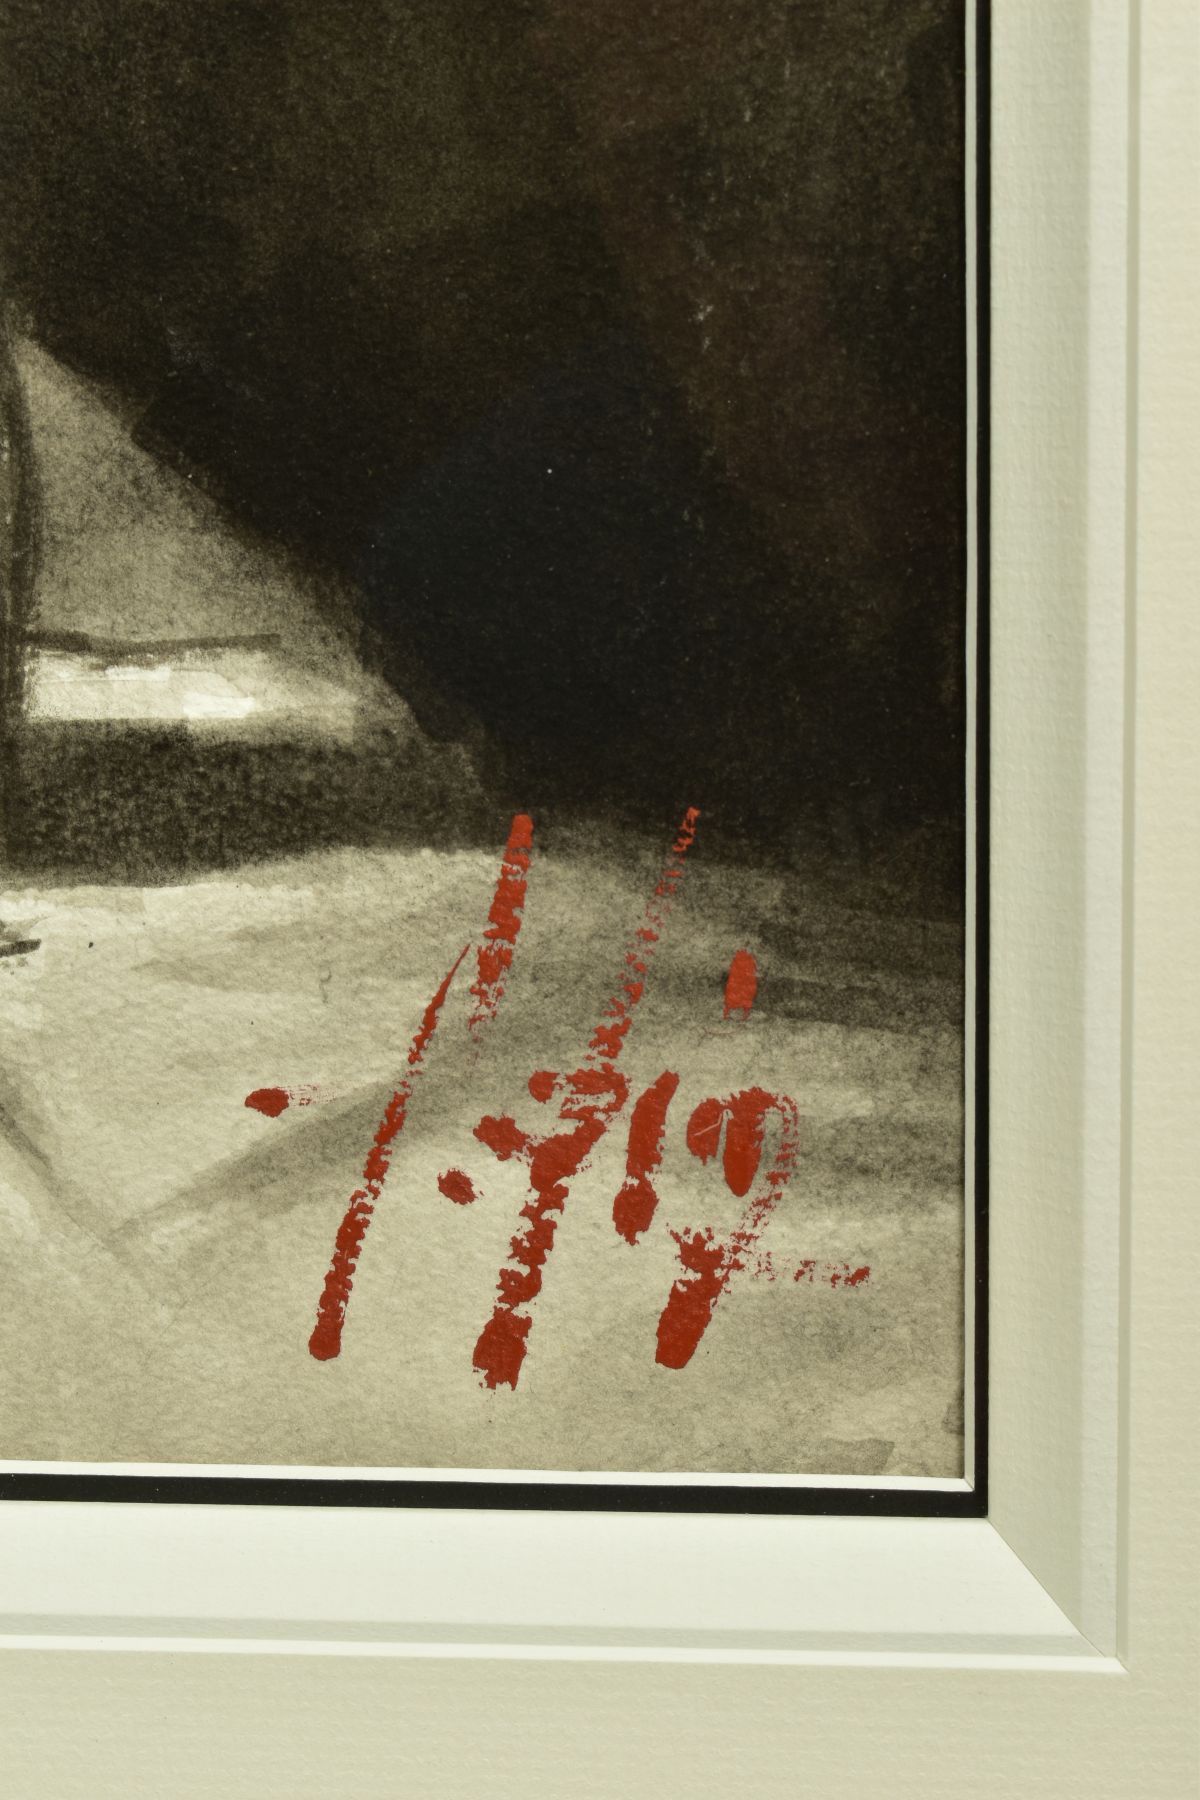 FABIAN PEREZ (ARGENTINA 1967), 'Andlucia VI', a portrait study of a scantily clad female figure, - Image 4 of 7